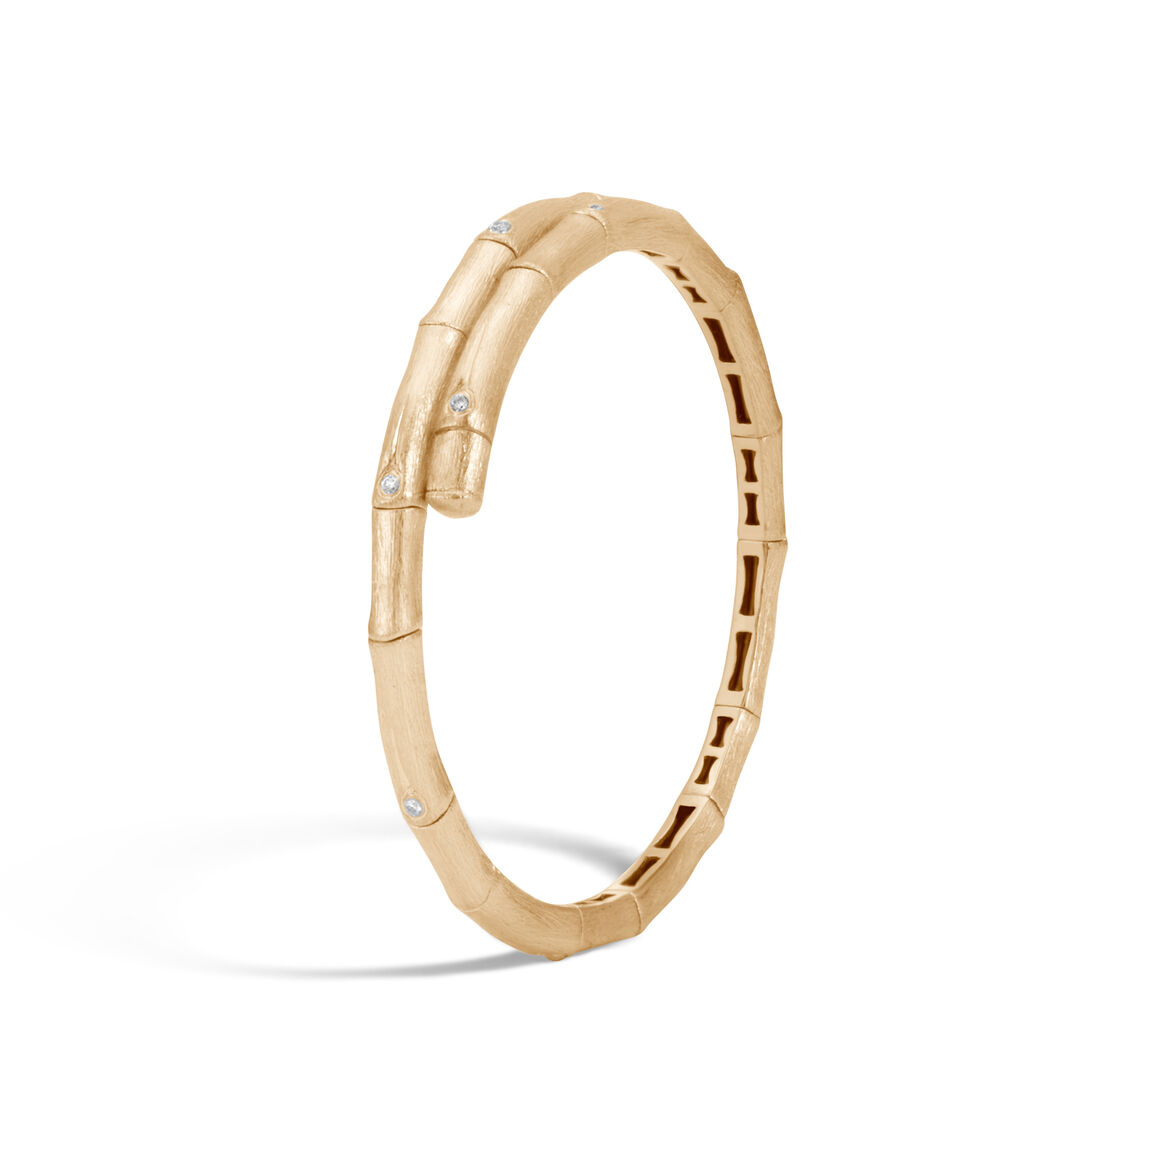 Bamboo Single Coil Bracelet in Brushed 18K Gold, Diamonds